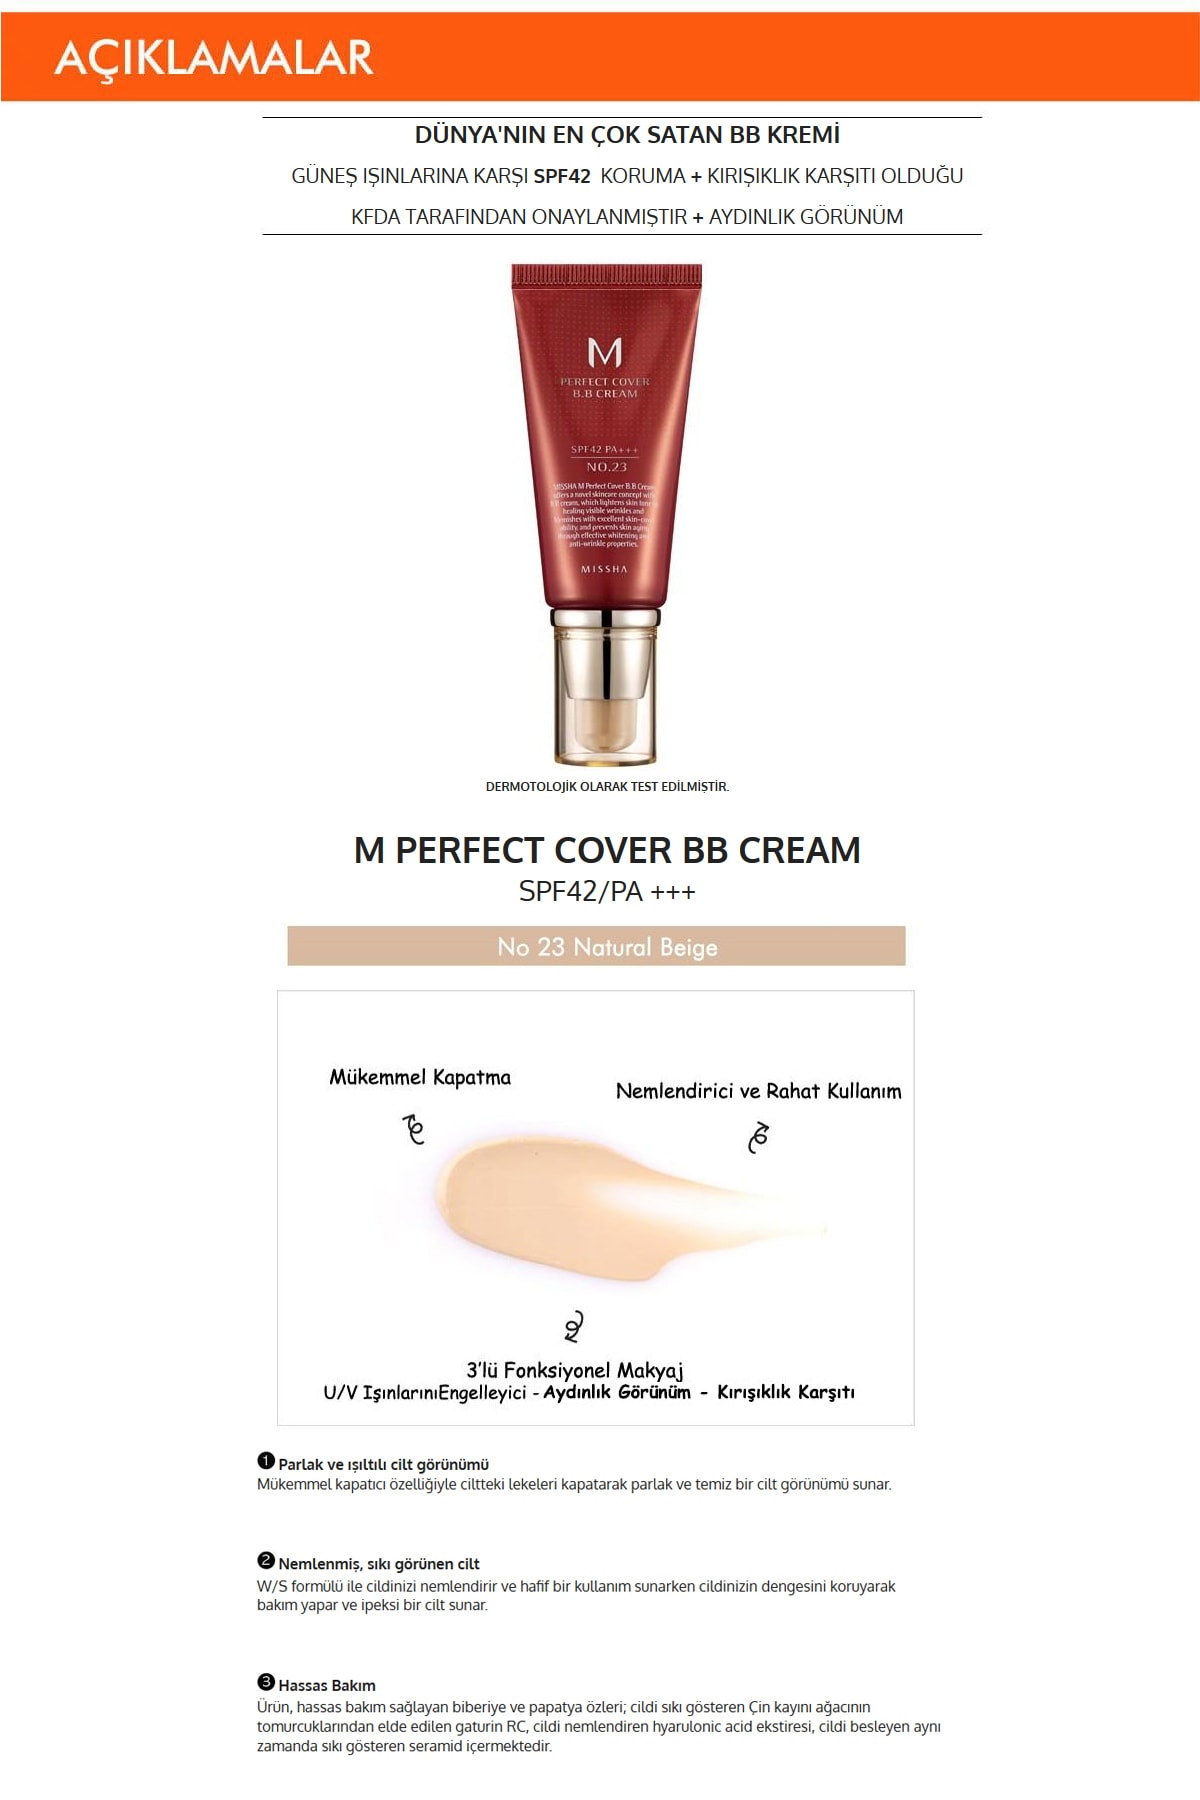 Missha Yoğun Kapatıcılık Sunan Nemlendirici BB Krem 50ml M Perfect Cover BB Cream SPF42/PA+++ No: 23 1